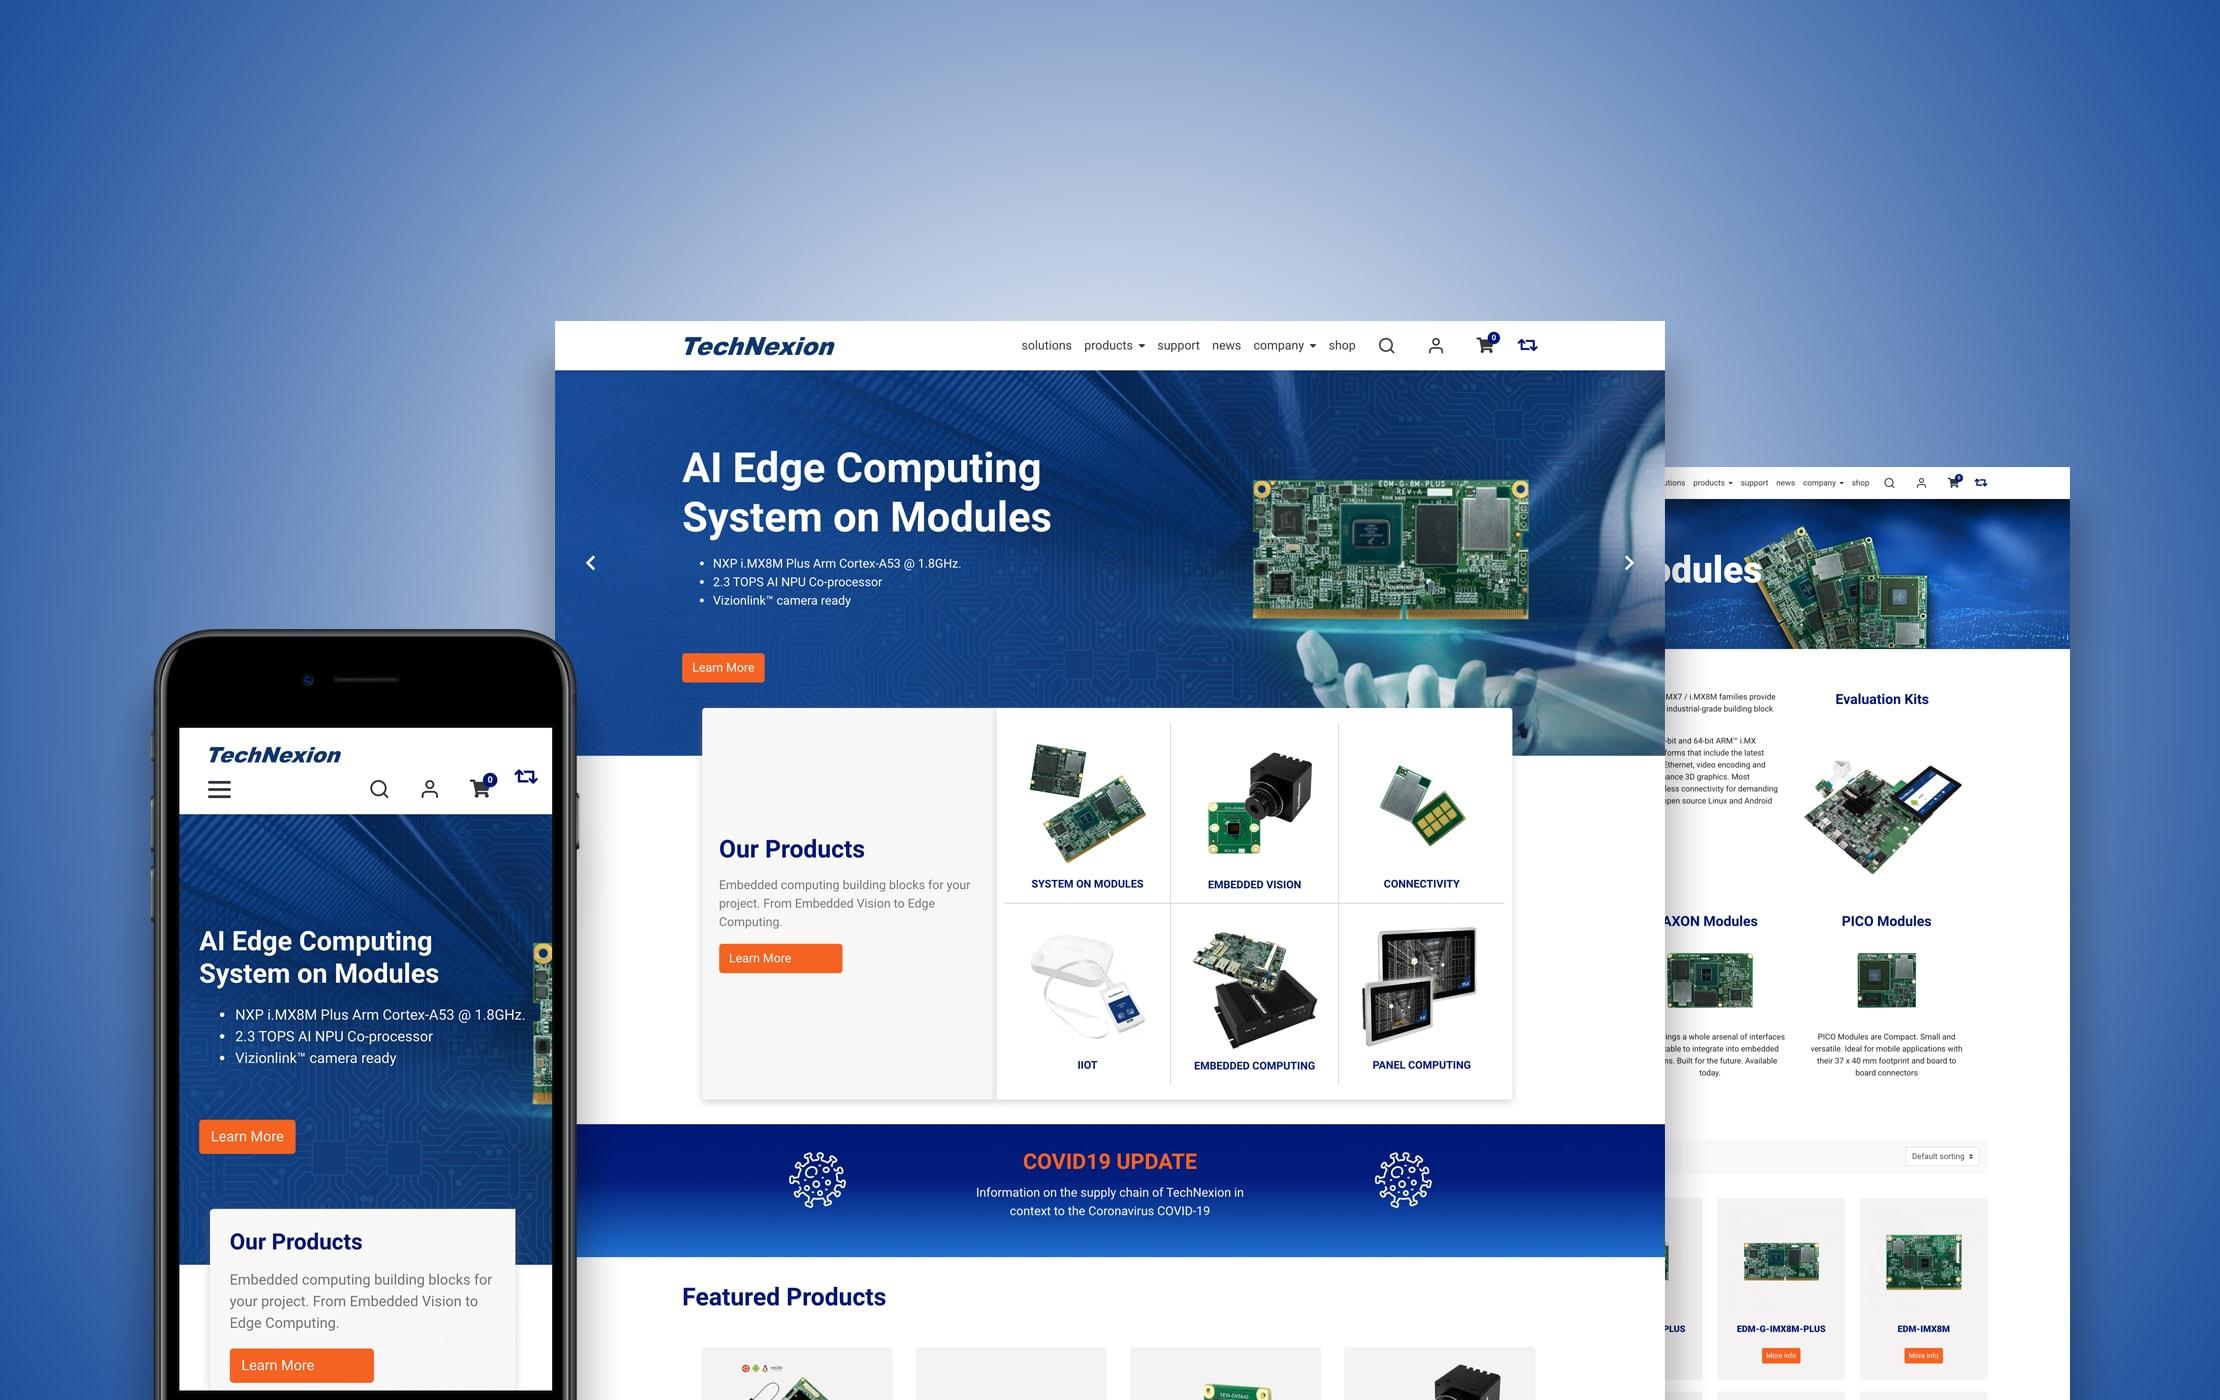 webshop-woocommerce-ecommerce-wordpress-dreamlab_portfolio_technexion@2x